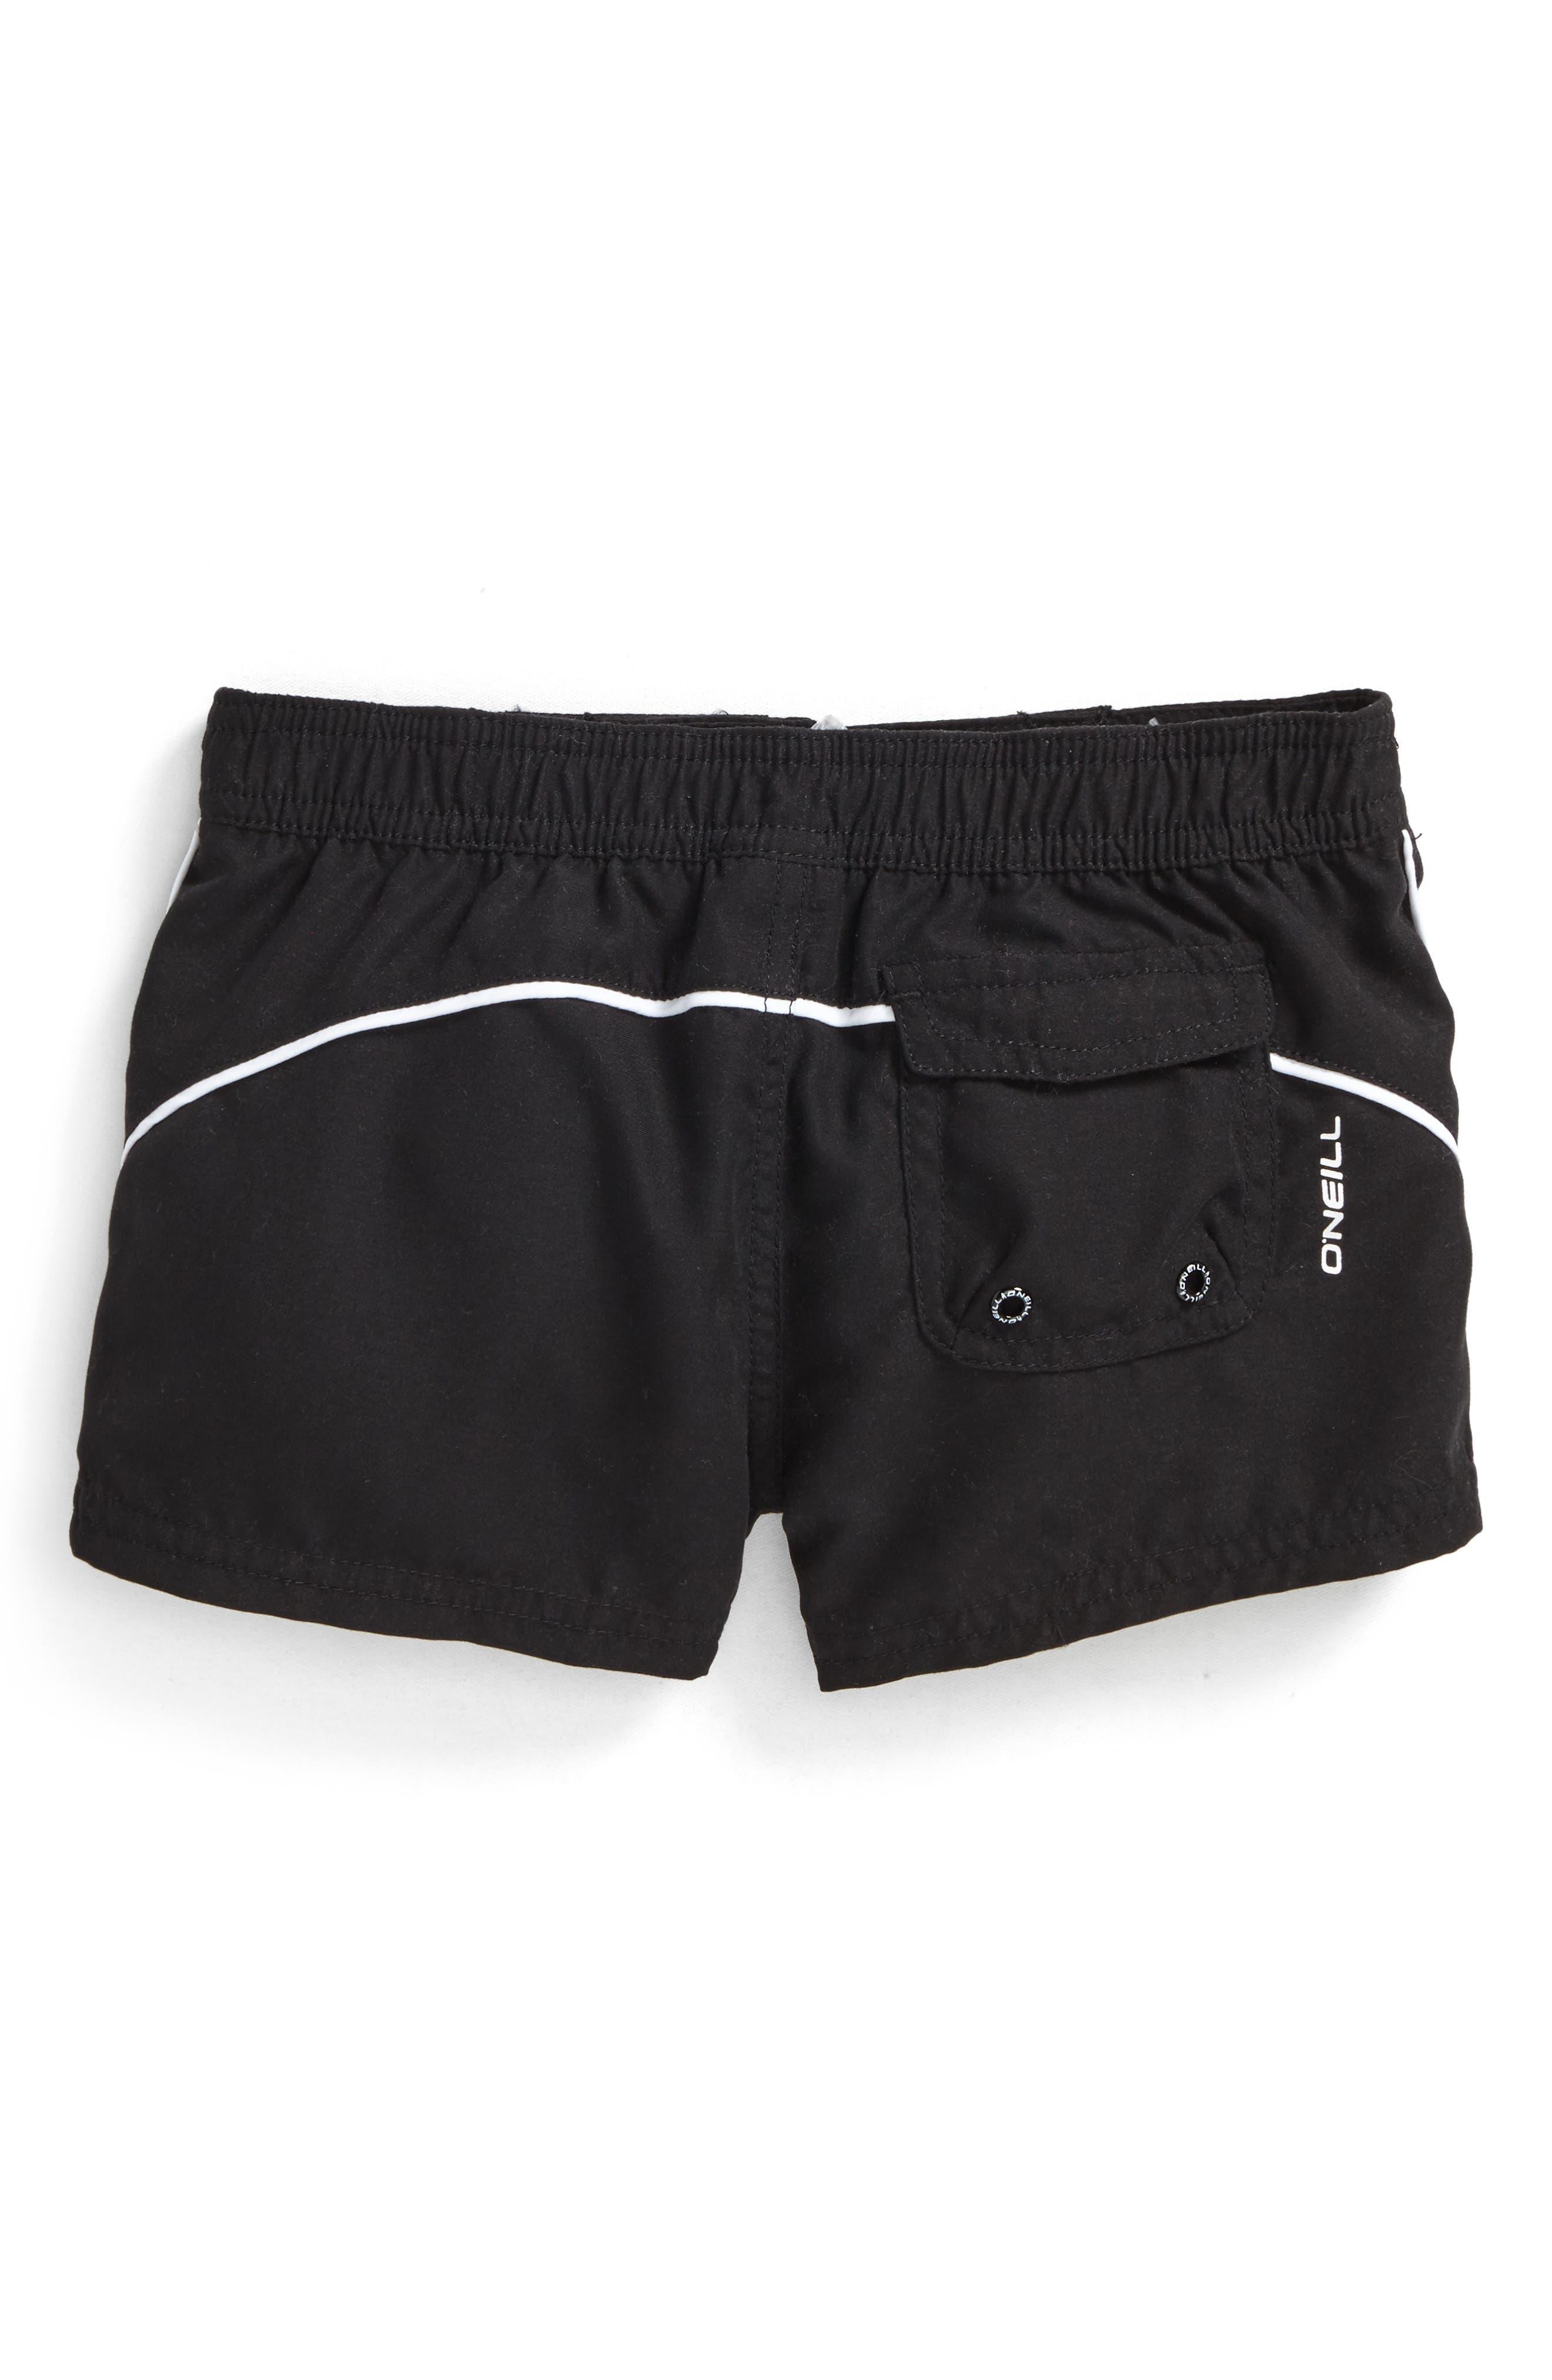 Salt Water Board Shorts,                             Alternate thumbnail 3, color,                             Black - Blk